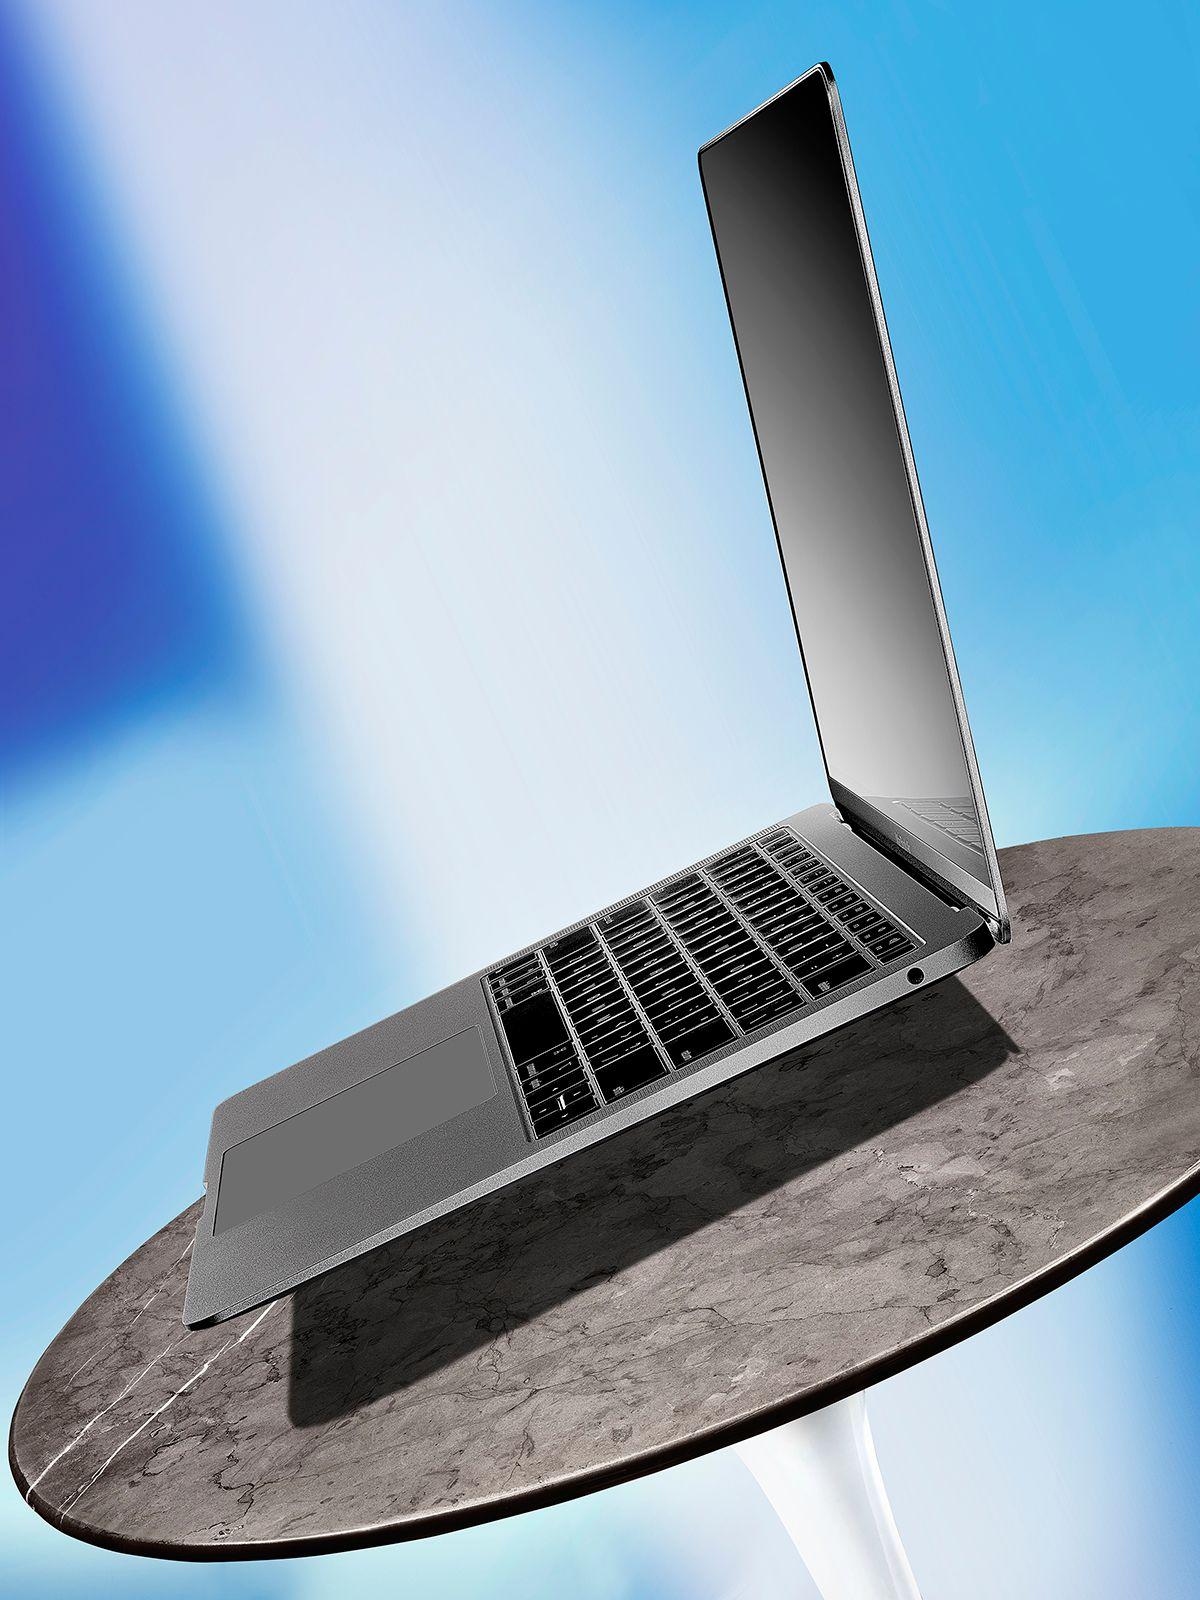 laptop_july19_04_4x5.jpg